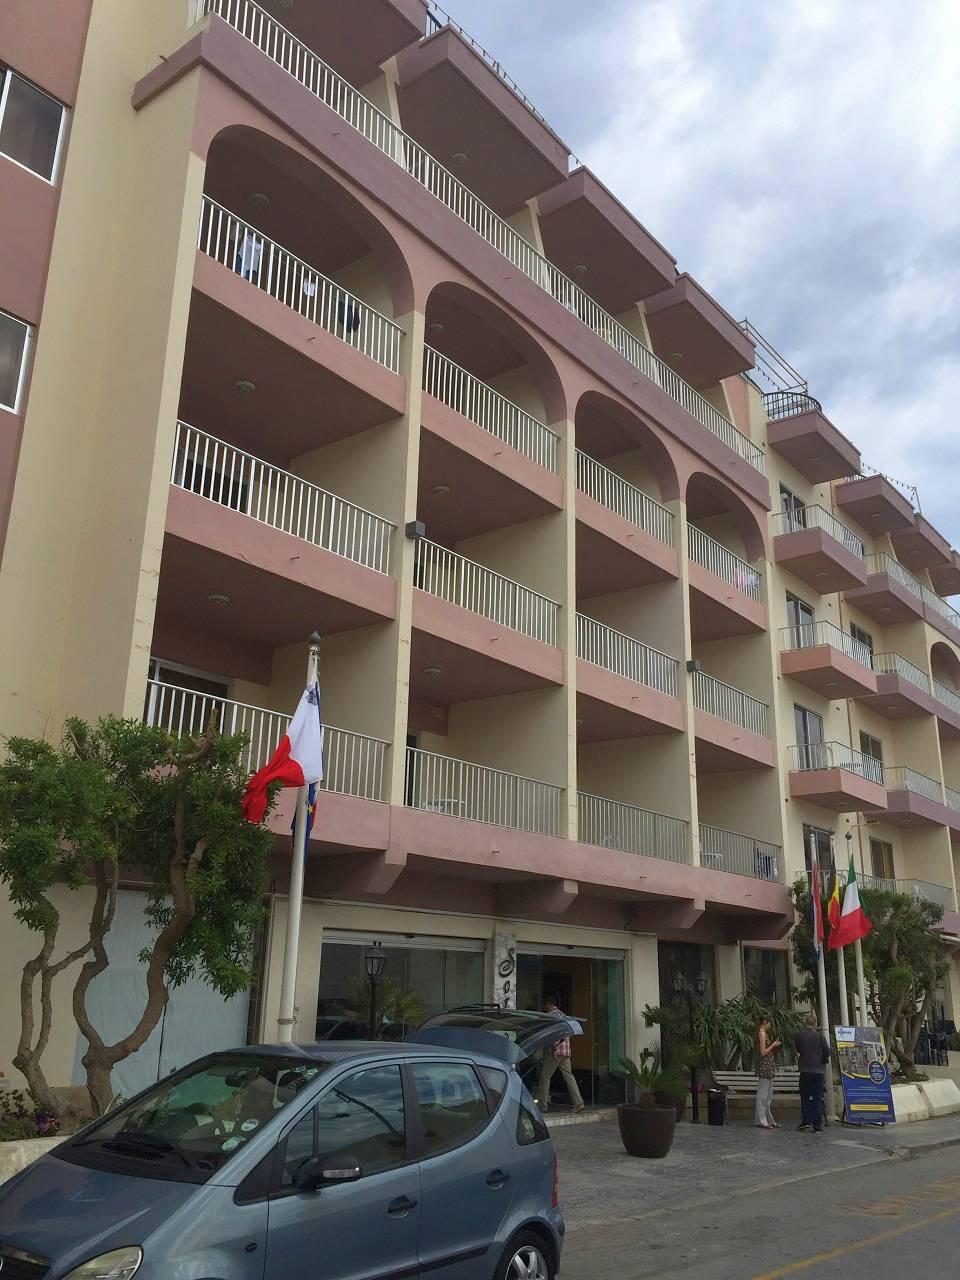 http://budavartours.hu/binaries/content/gallery/budavar/locations/accomodations/M%C3%A1lta/st.-paul-s-bay/Soreda+Hotel/soreda-hotel-malta-st.-pauls-bay2.jpg